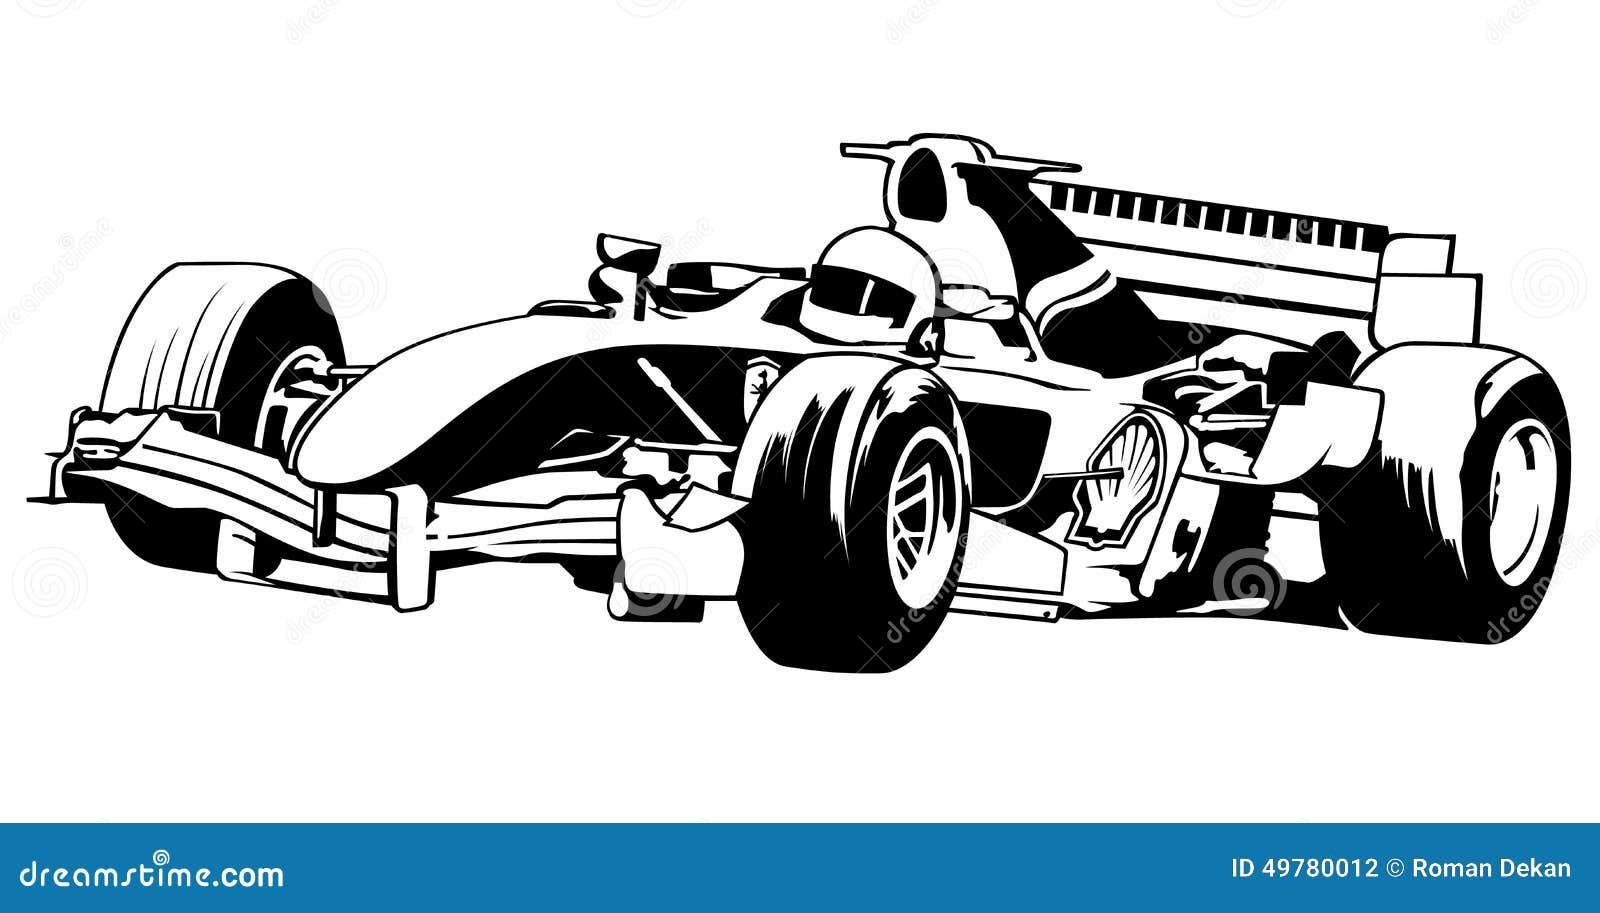 Checkered Flag Clip Art 9511 together with Kleurplaten Cars additionally Stock Illustration Formula One Racing Car Black Outline Illustration Vector Image49780012 as well Blue race car with checkered flag stationery 229785614517486736 together with Car Coloring Pages For Boys. on indy race car clip art